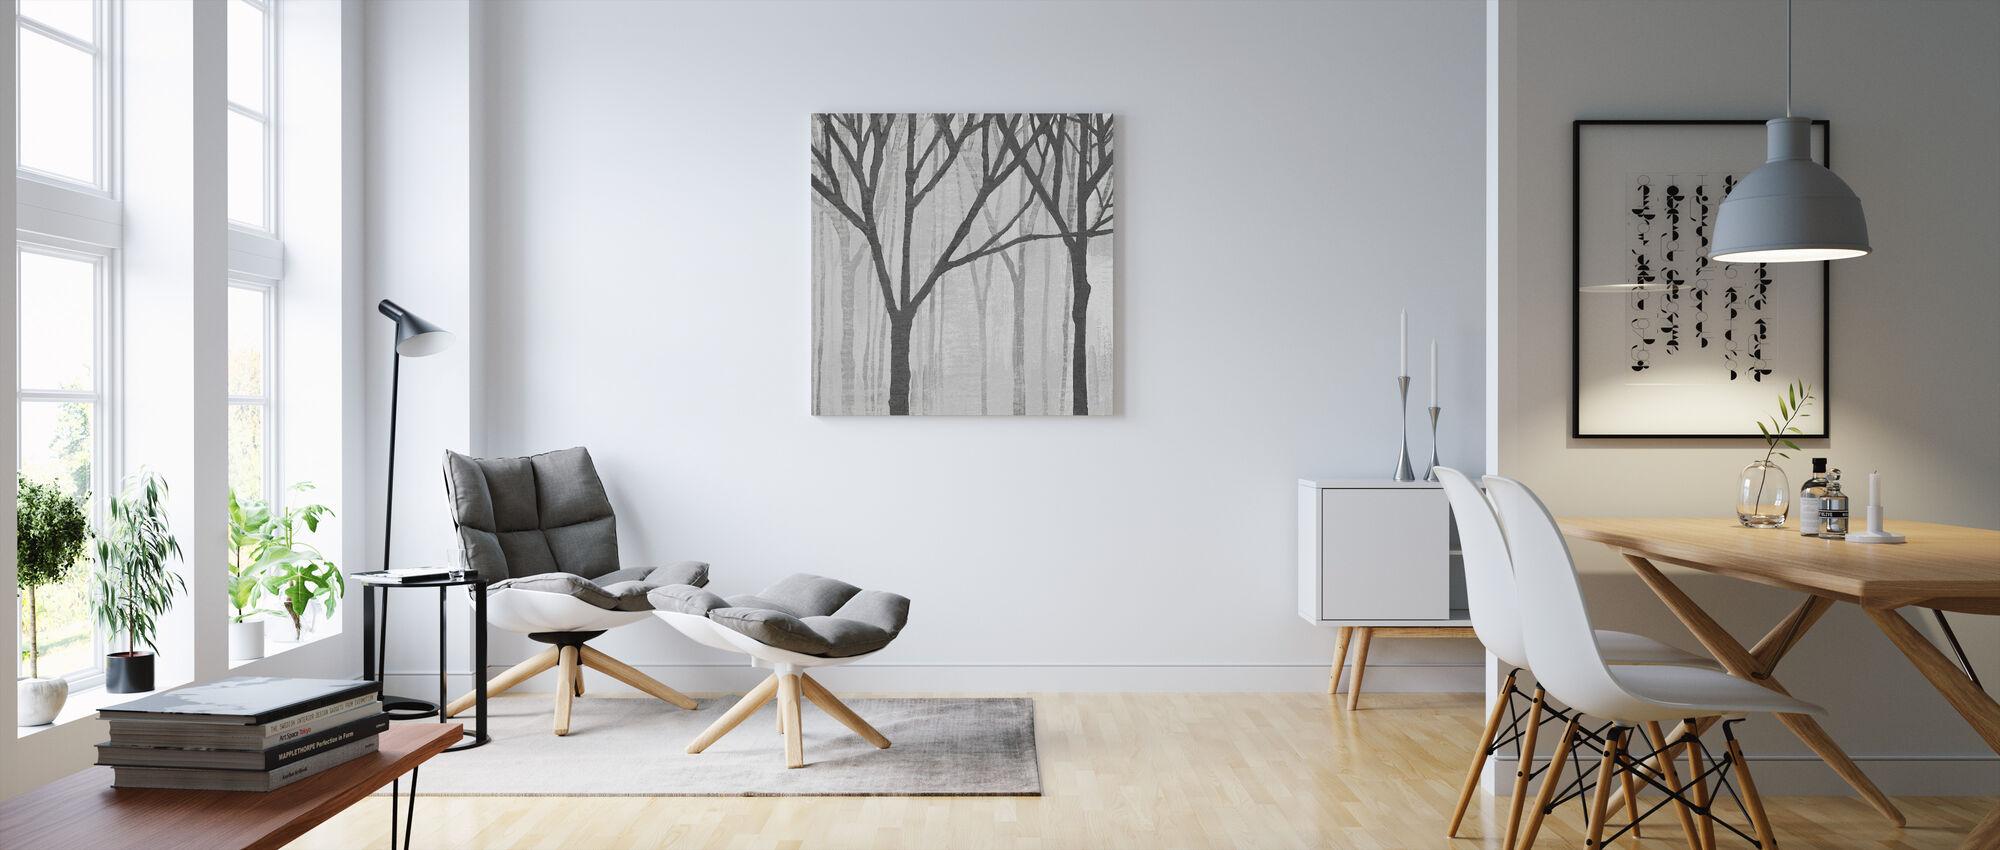 Kevät puut Greystone III - Canvastaulu - Olohuone